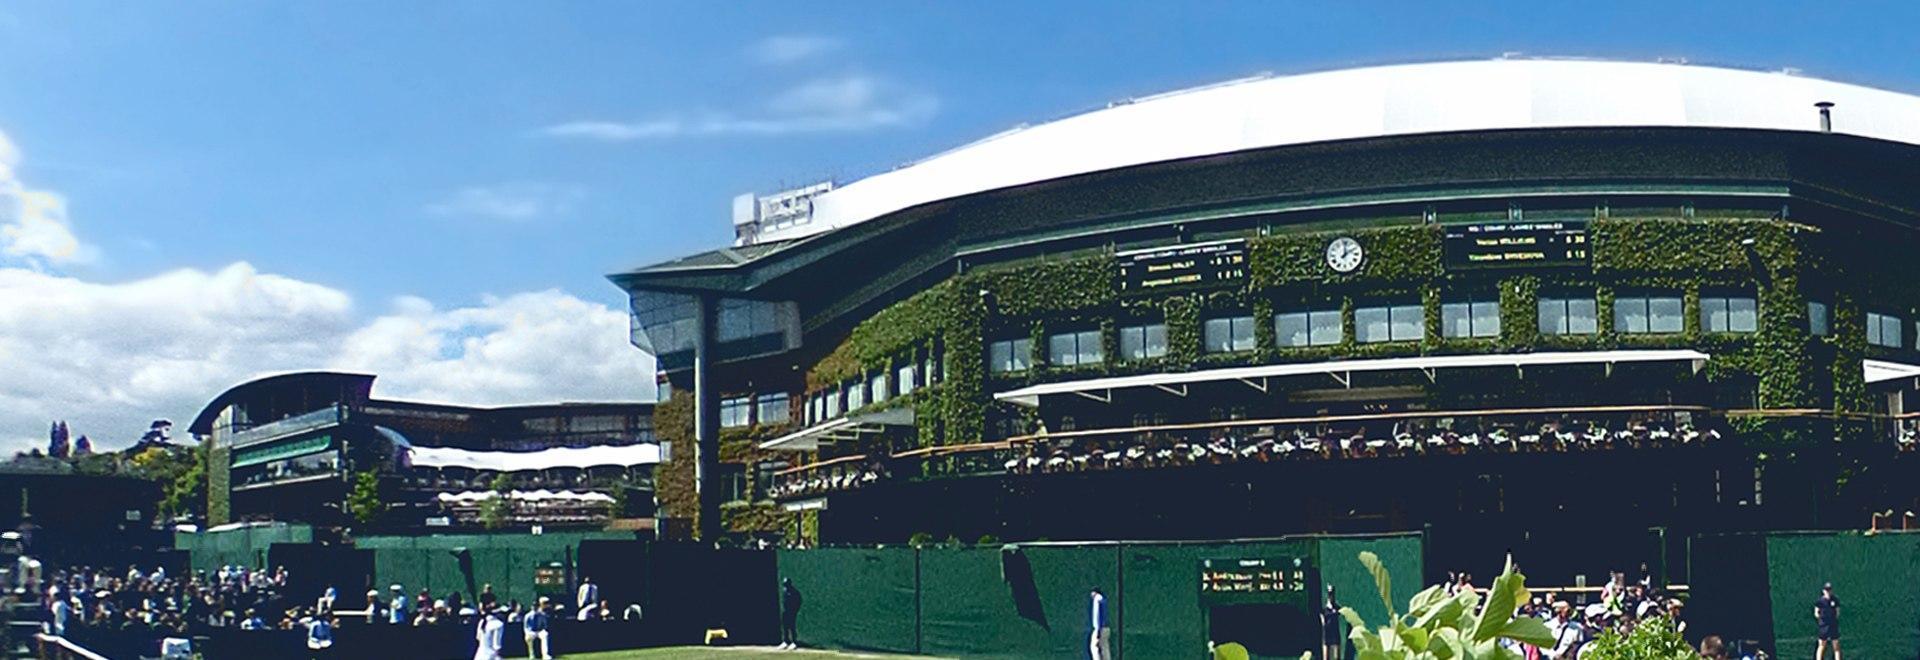 Wimbledon 2001: Federer - Sampras. Ottavi